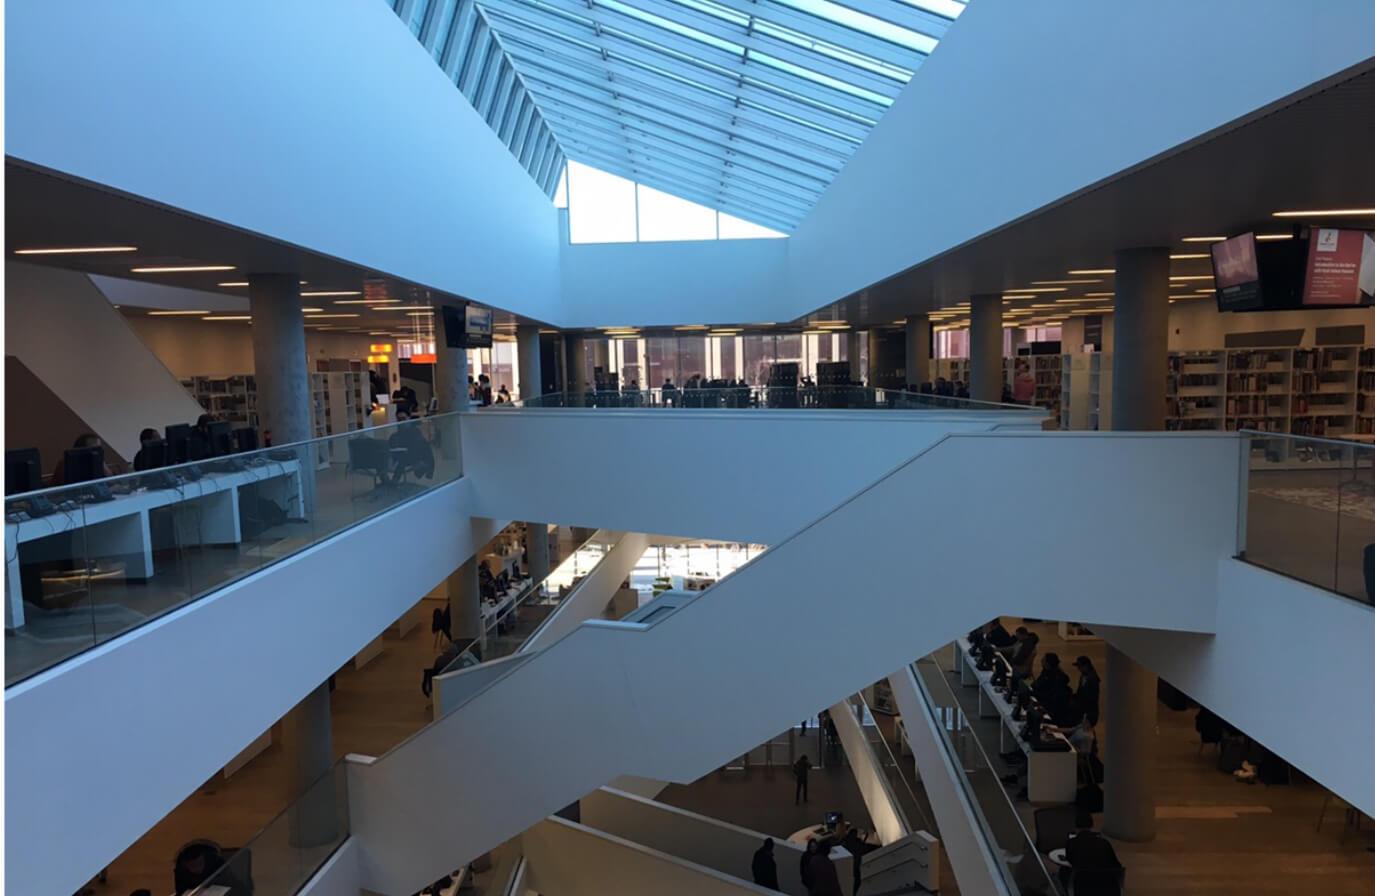 Halifax Central Library は吹き抜けが真ん中にある大きな施設です。ここで日本人とばったりあったりします。